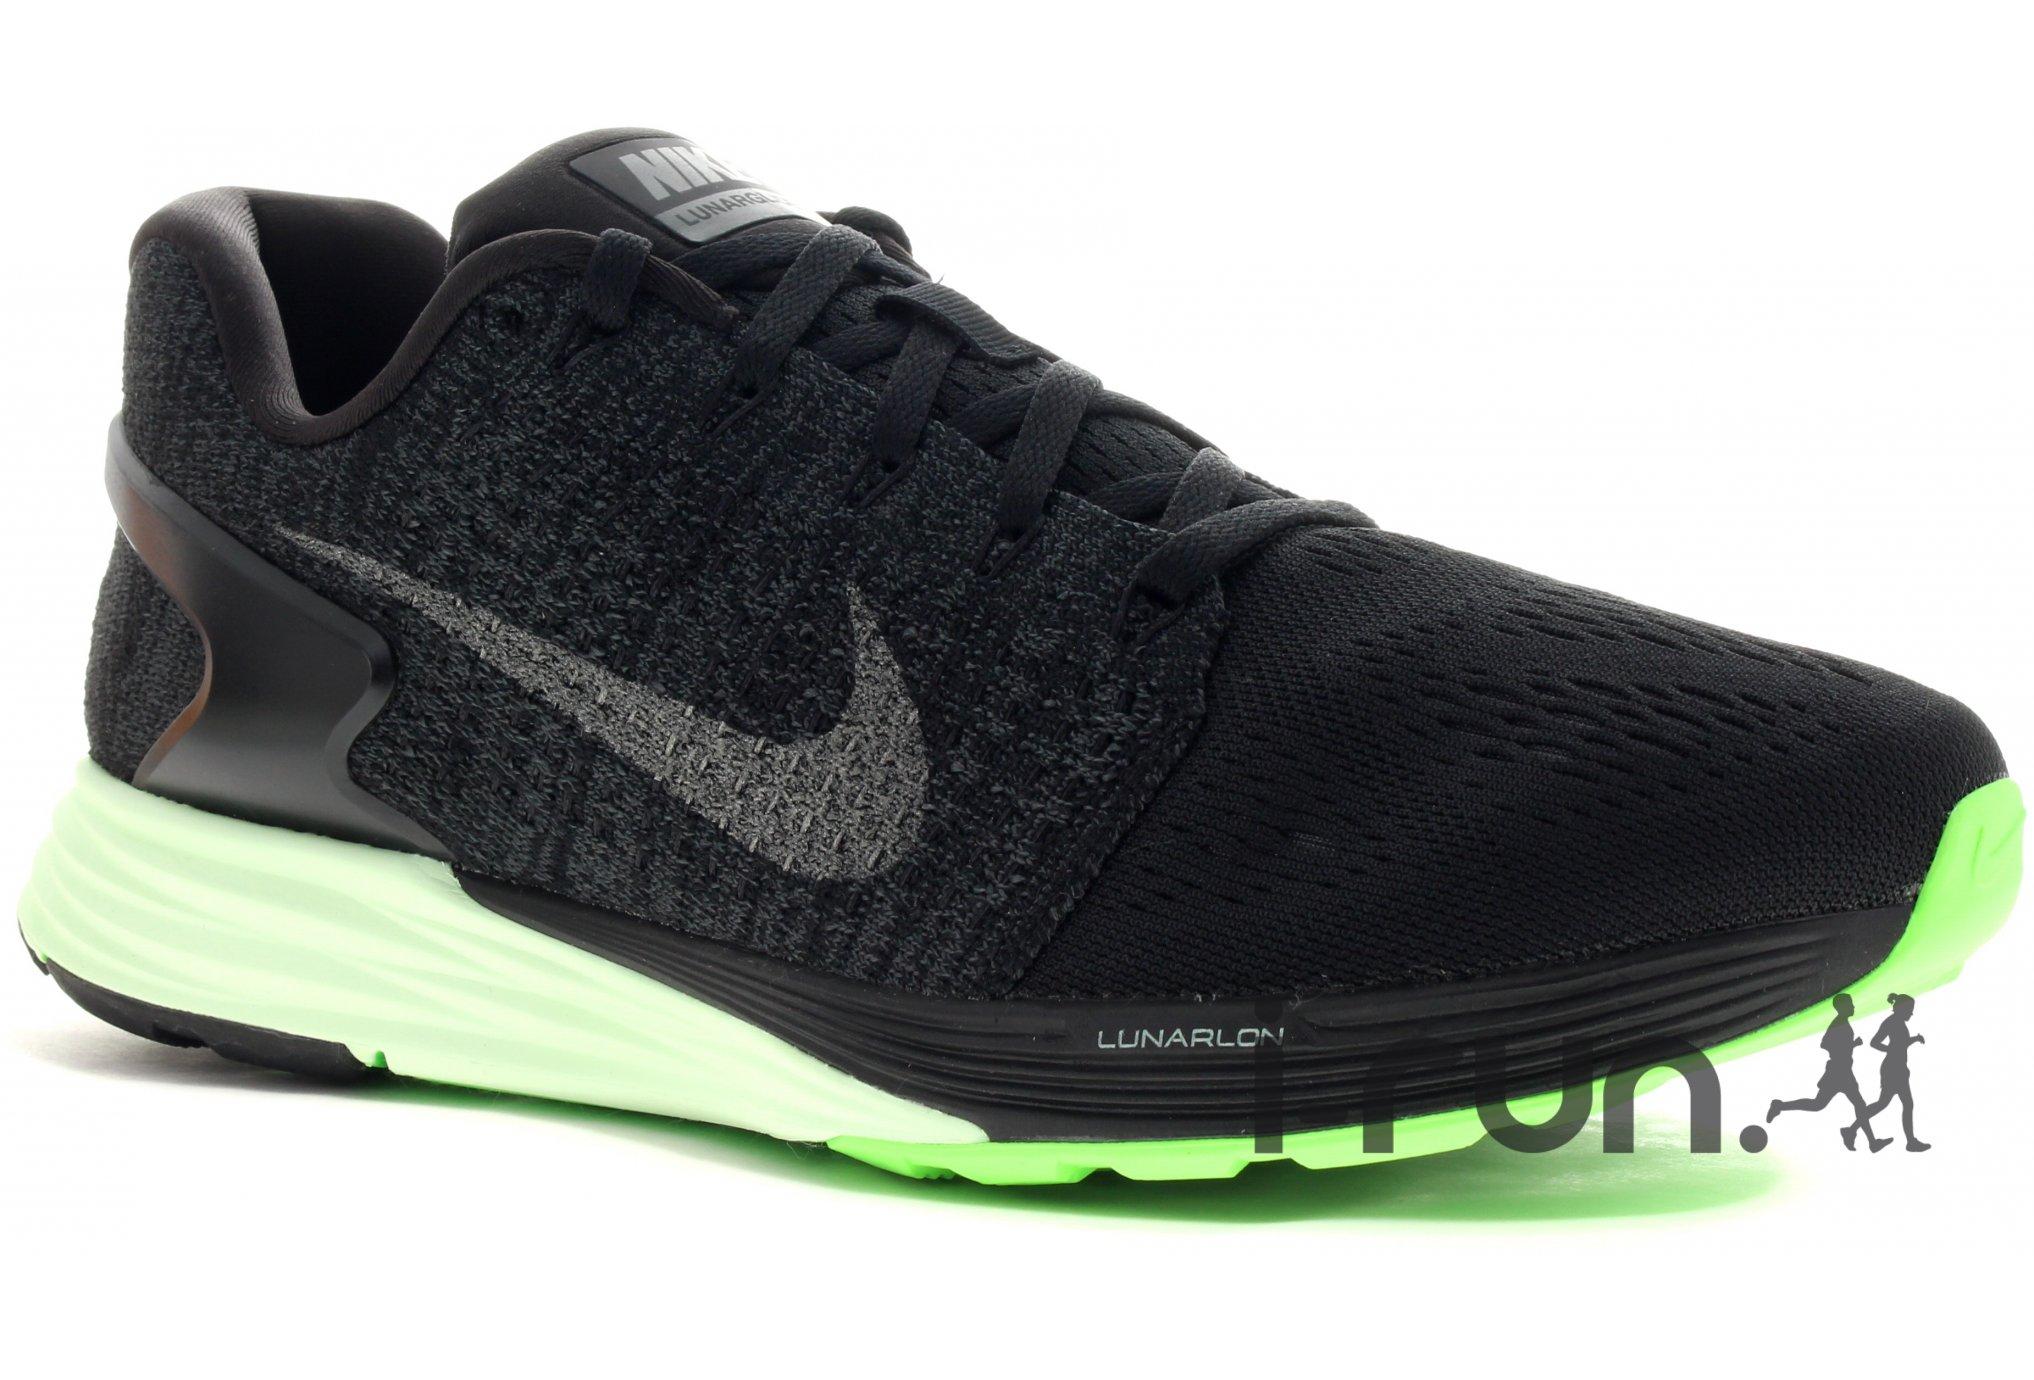 Nike Lunarglide 7 Midnight M Chaussures homme